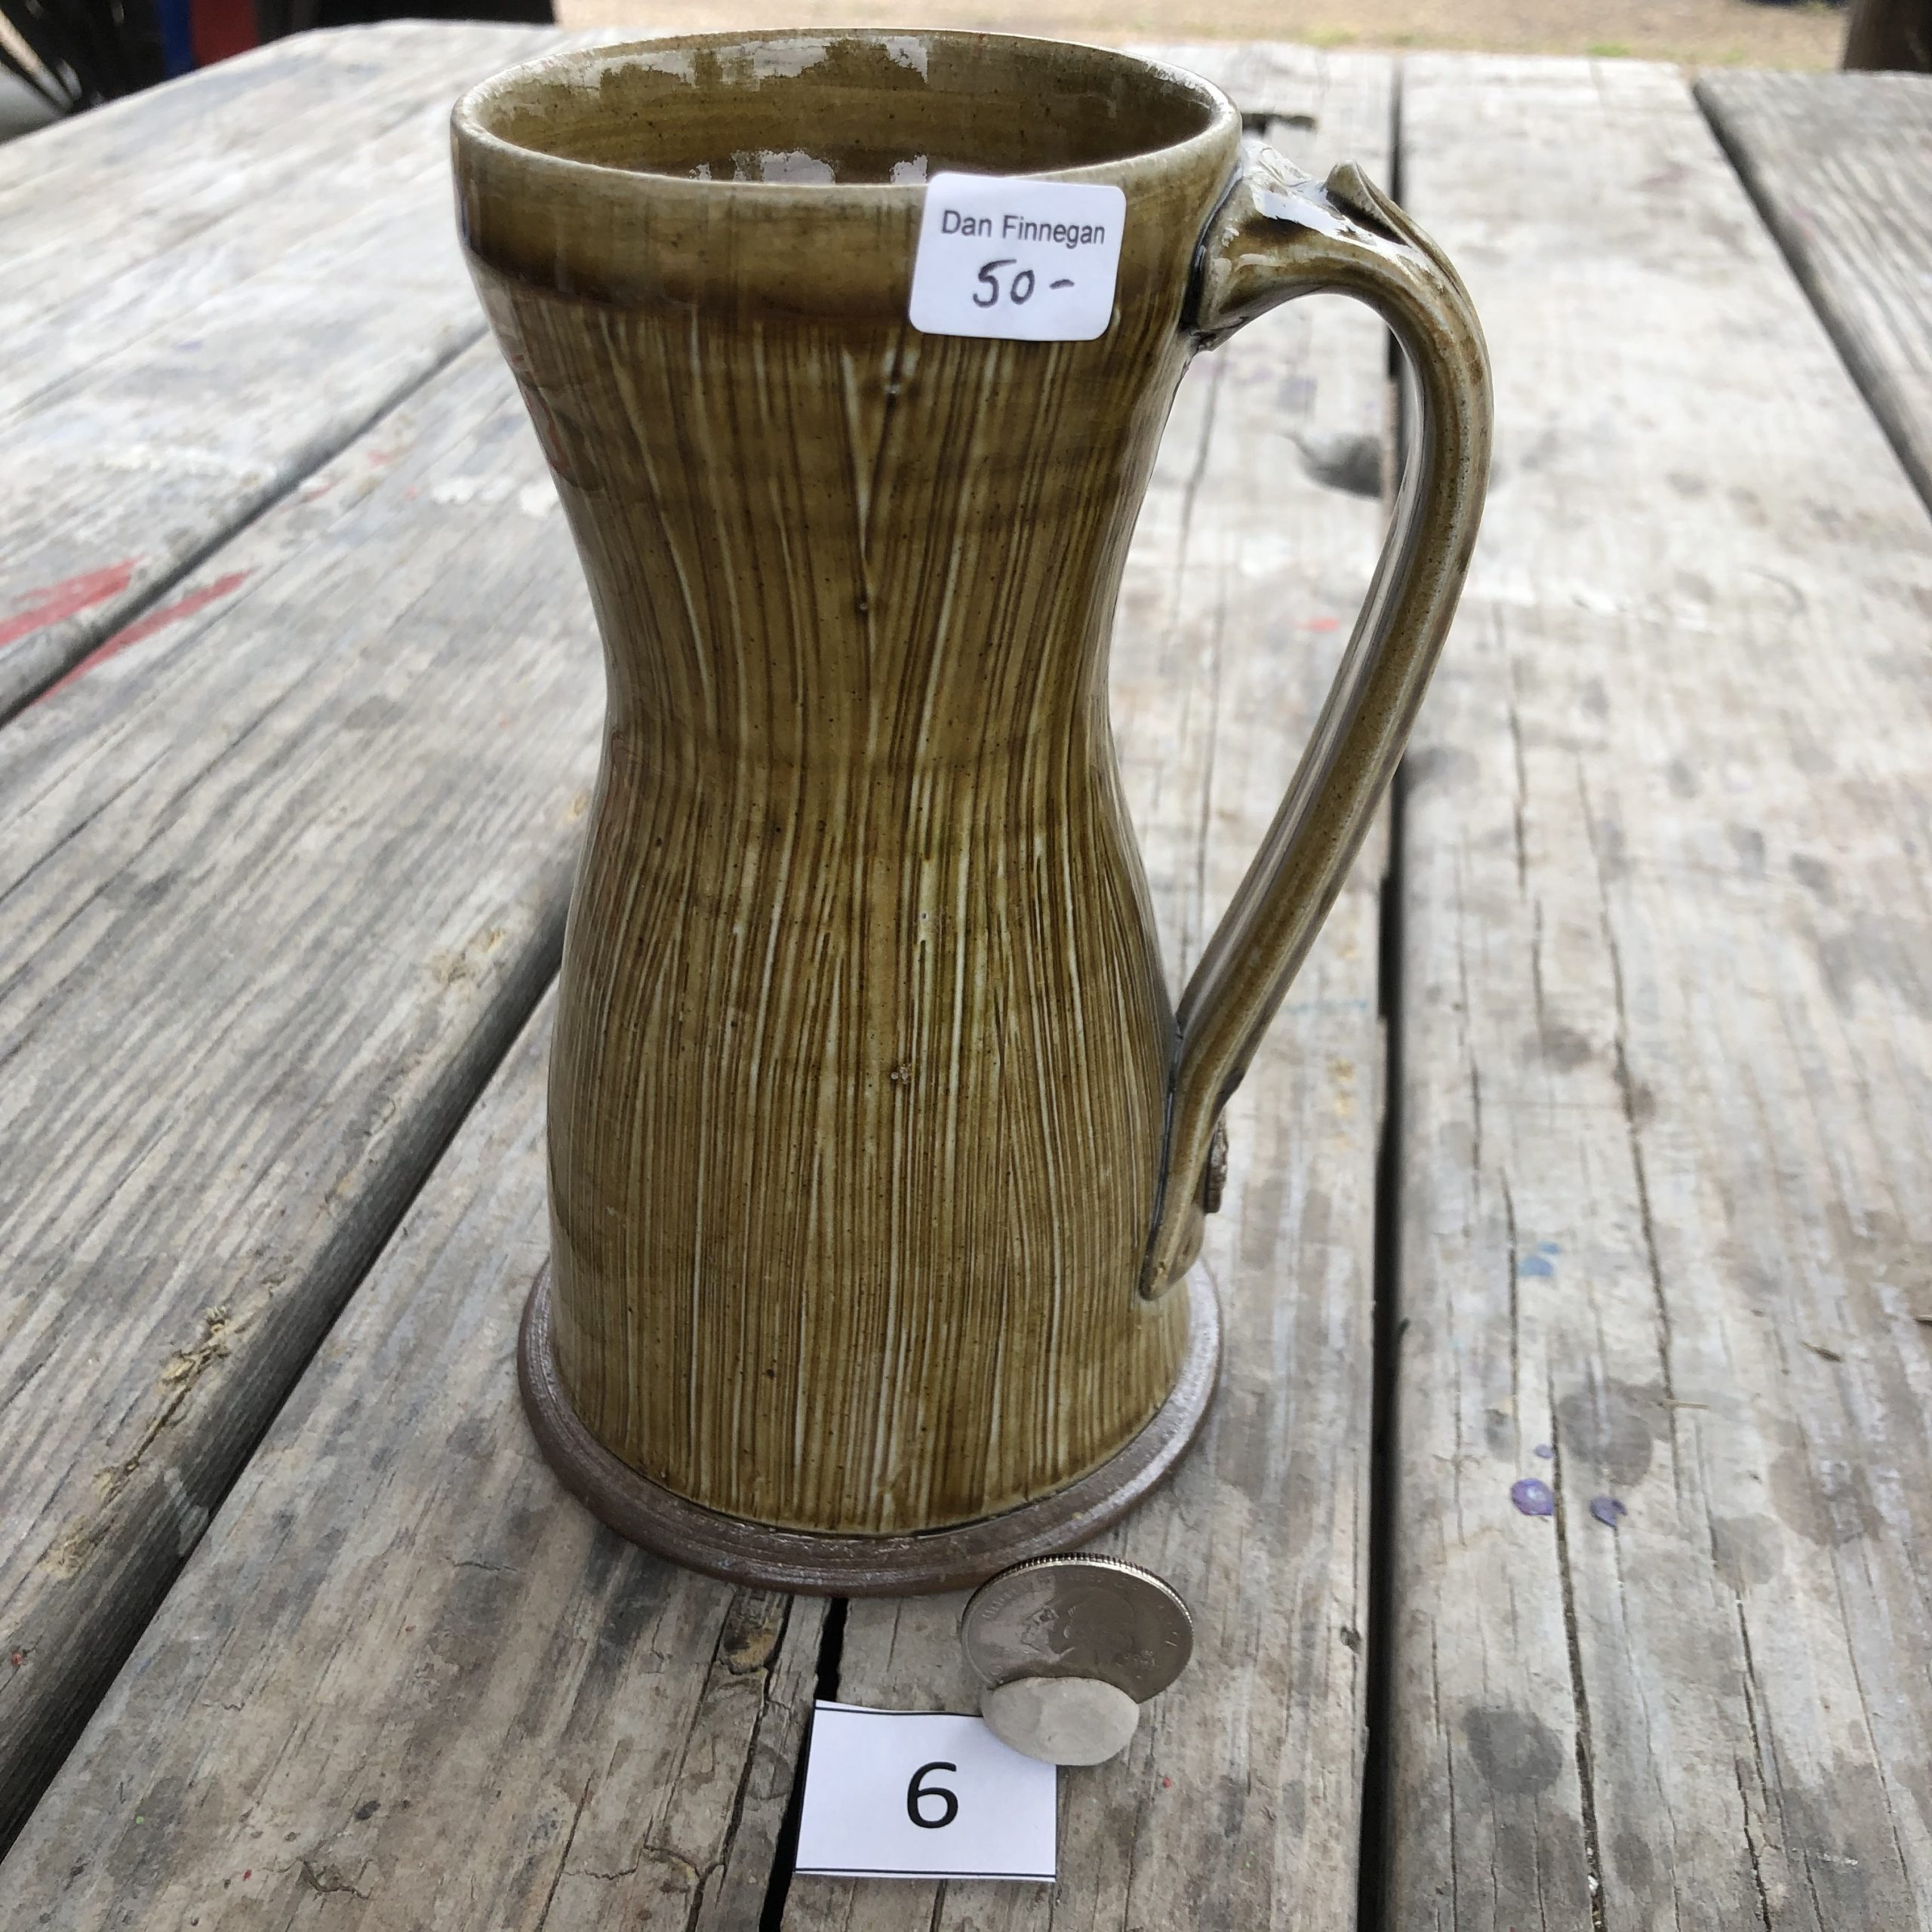 Dan Finnegan Hakame Texture Mug #6